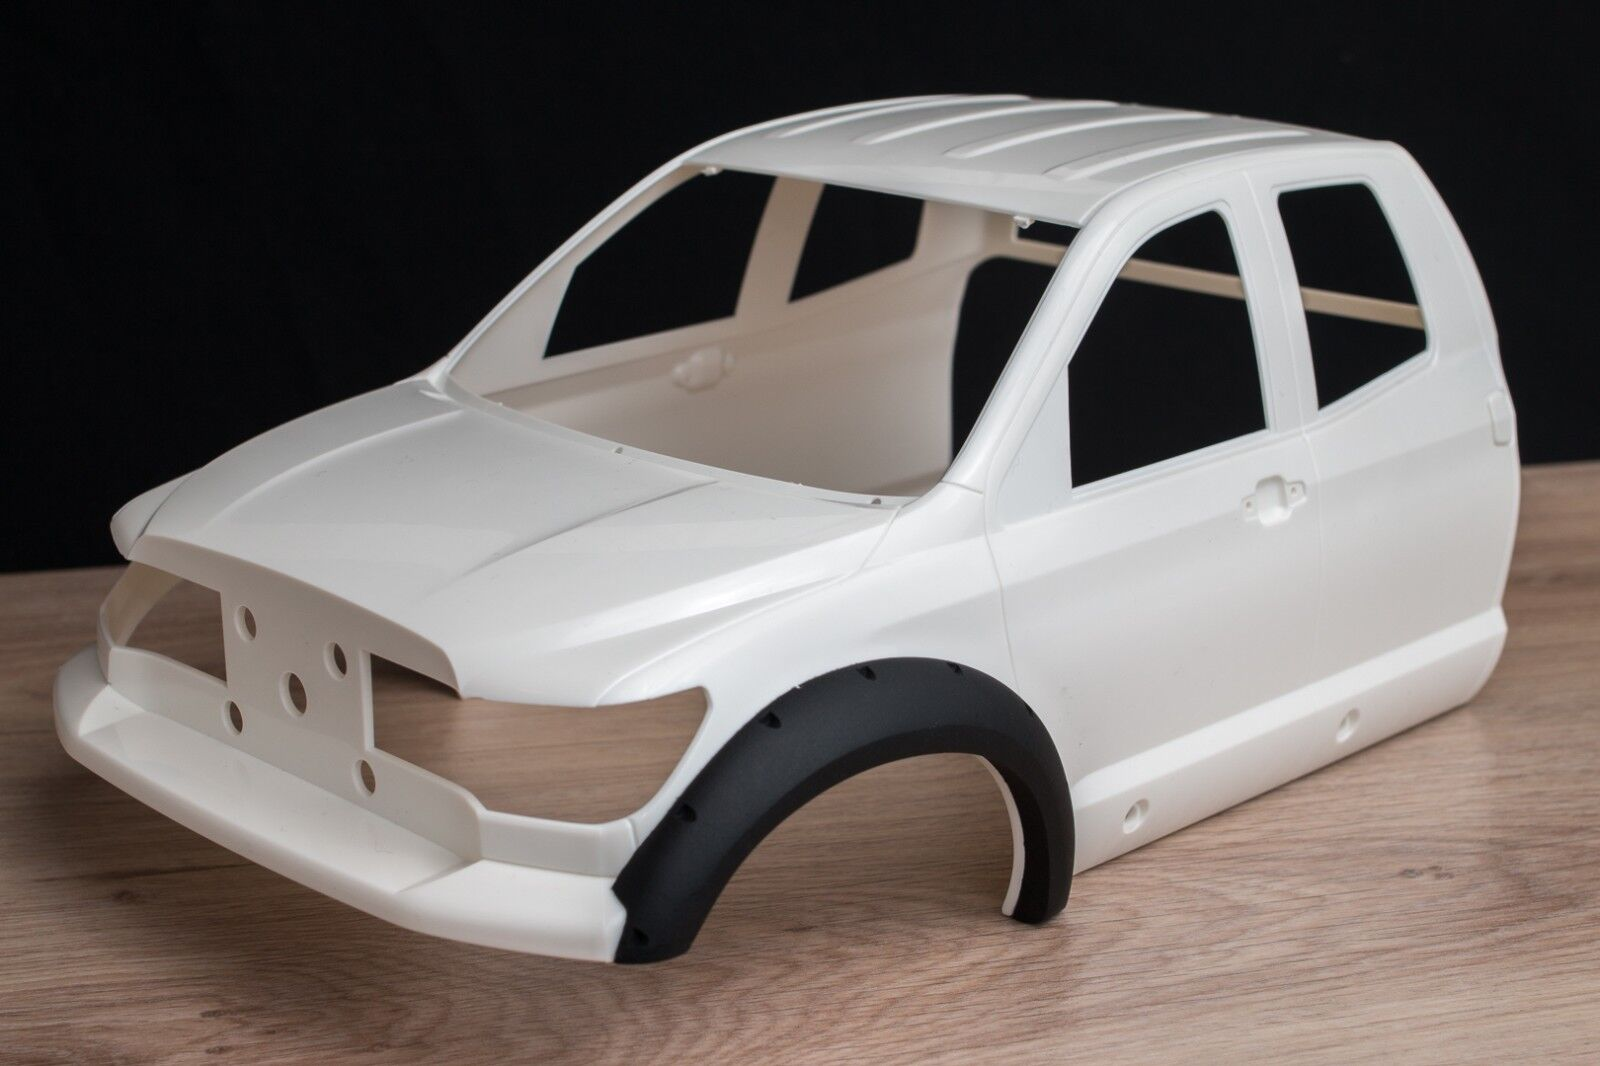 Rubber Fenders for Tamiya Toyota Tundra High Lift RC Axial Tamiya RC4WD